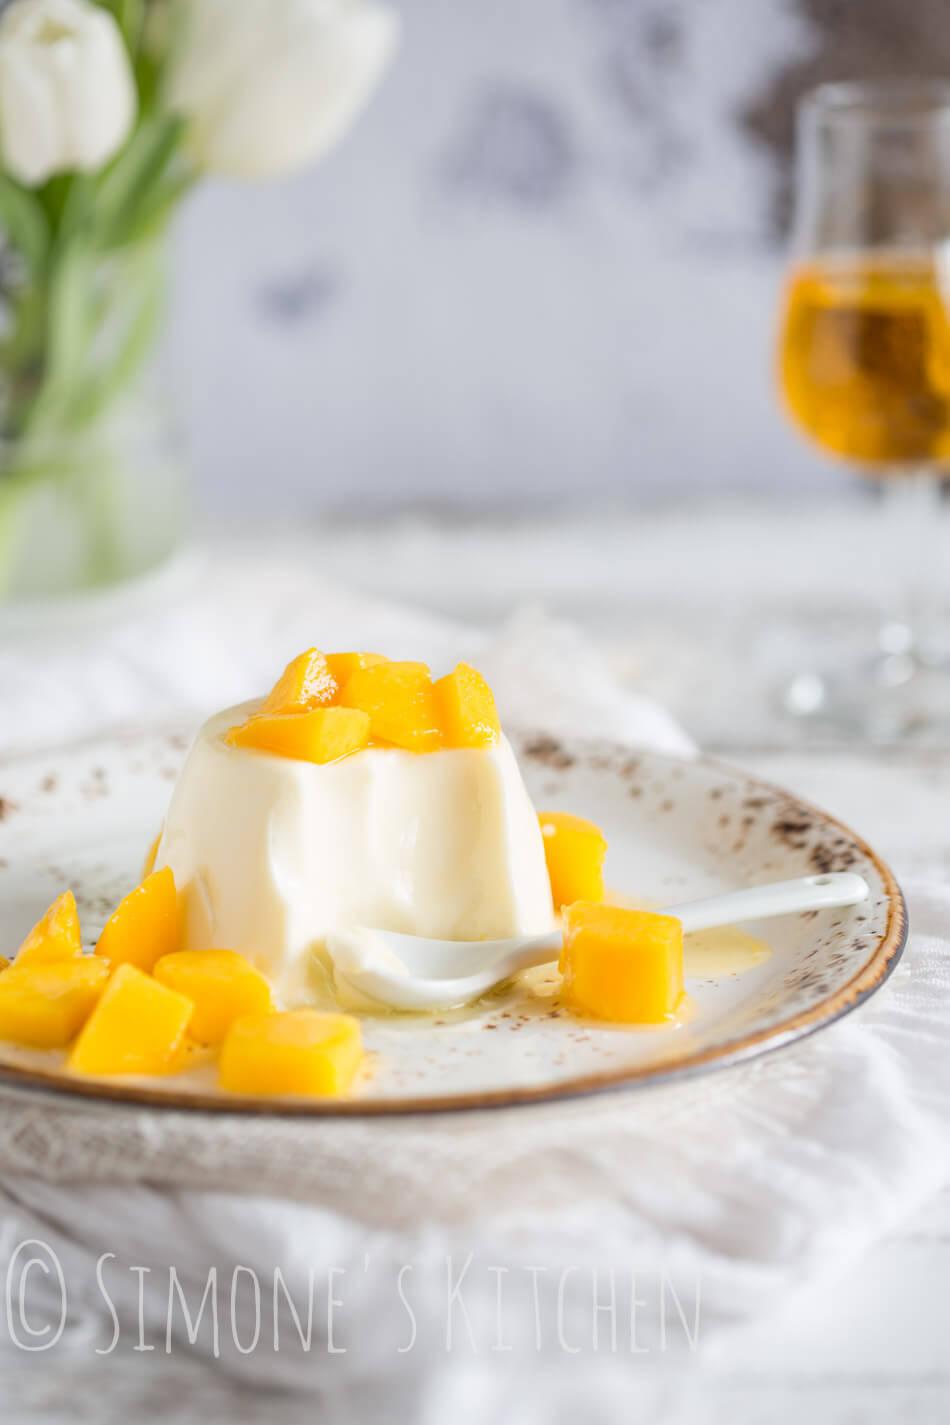 pannacotta met licor 43 en mango | simoneskitchen.nl